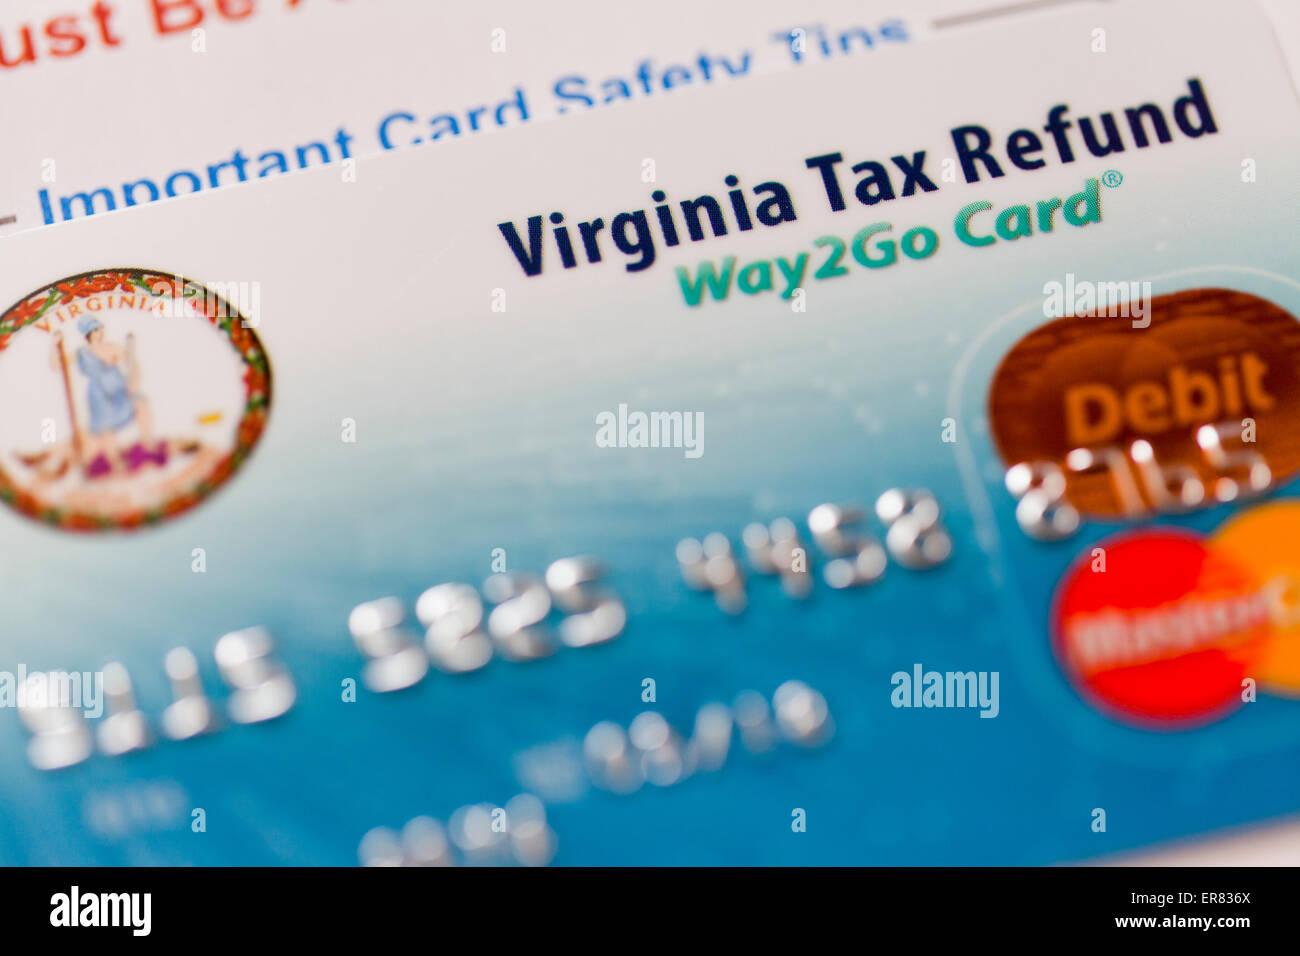 Virginia state income tax refund debit card - Stock Image